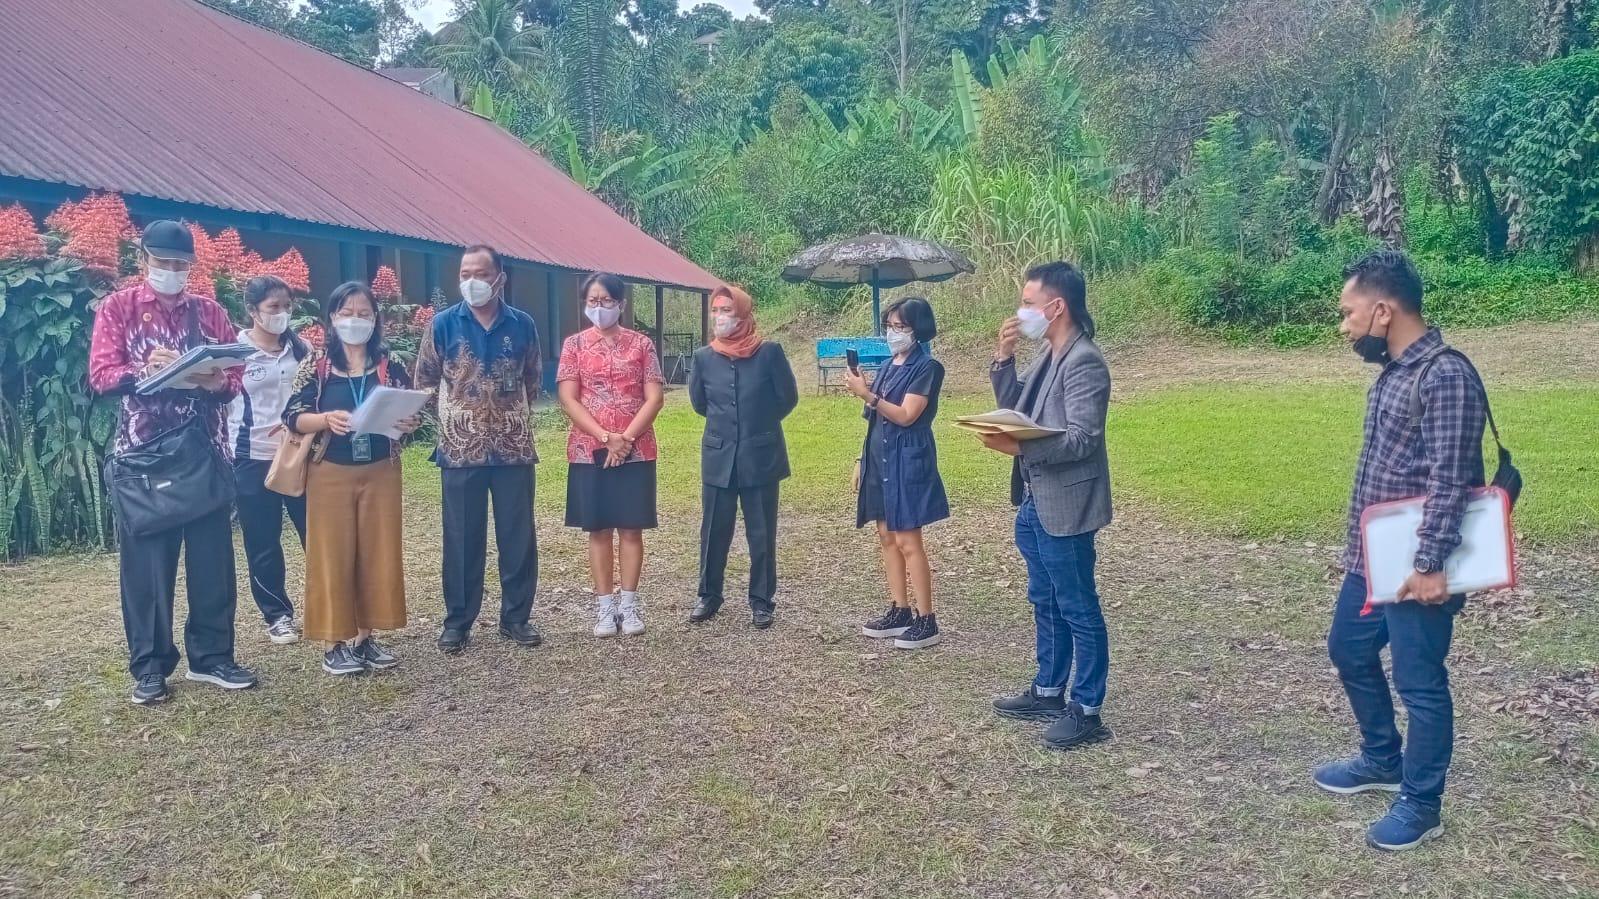 Pengadilan Negeri Simalungun Melakukan Pemeriksaan Setempat di Kel. Parapat, Kec. Girsang Sipangan Bolon Kabupaten Simalungun